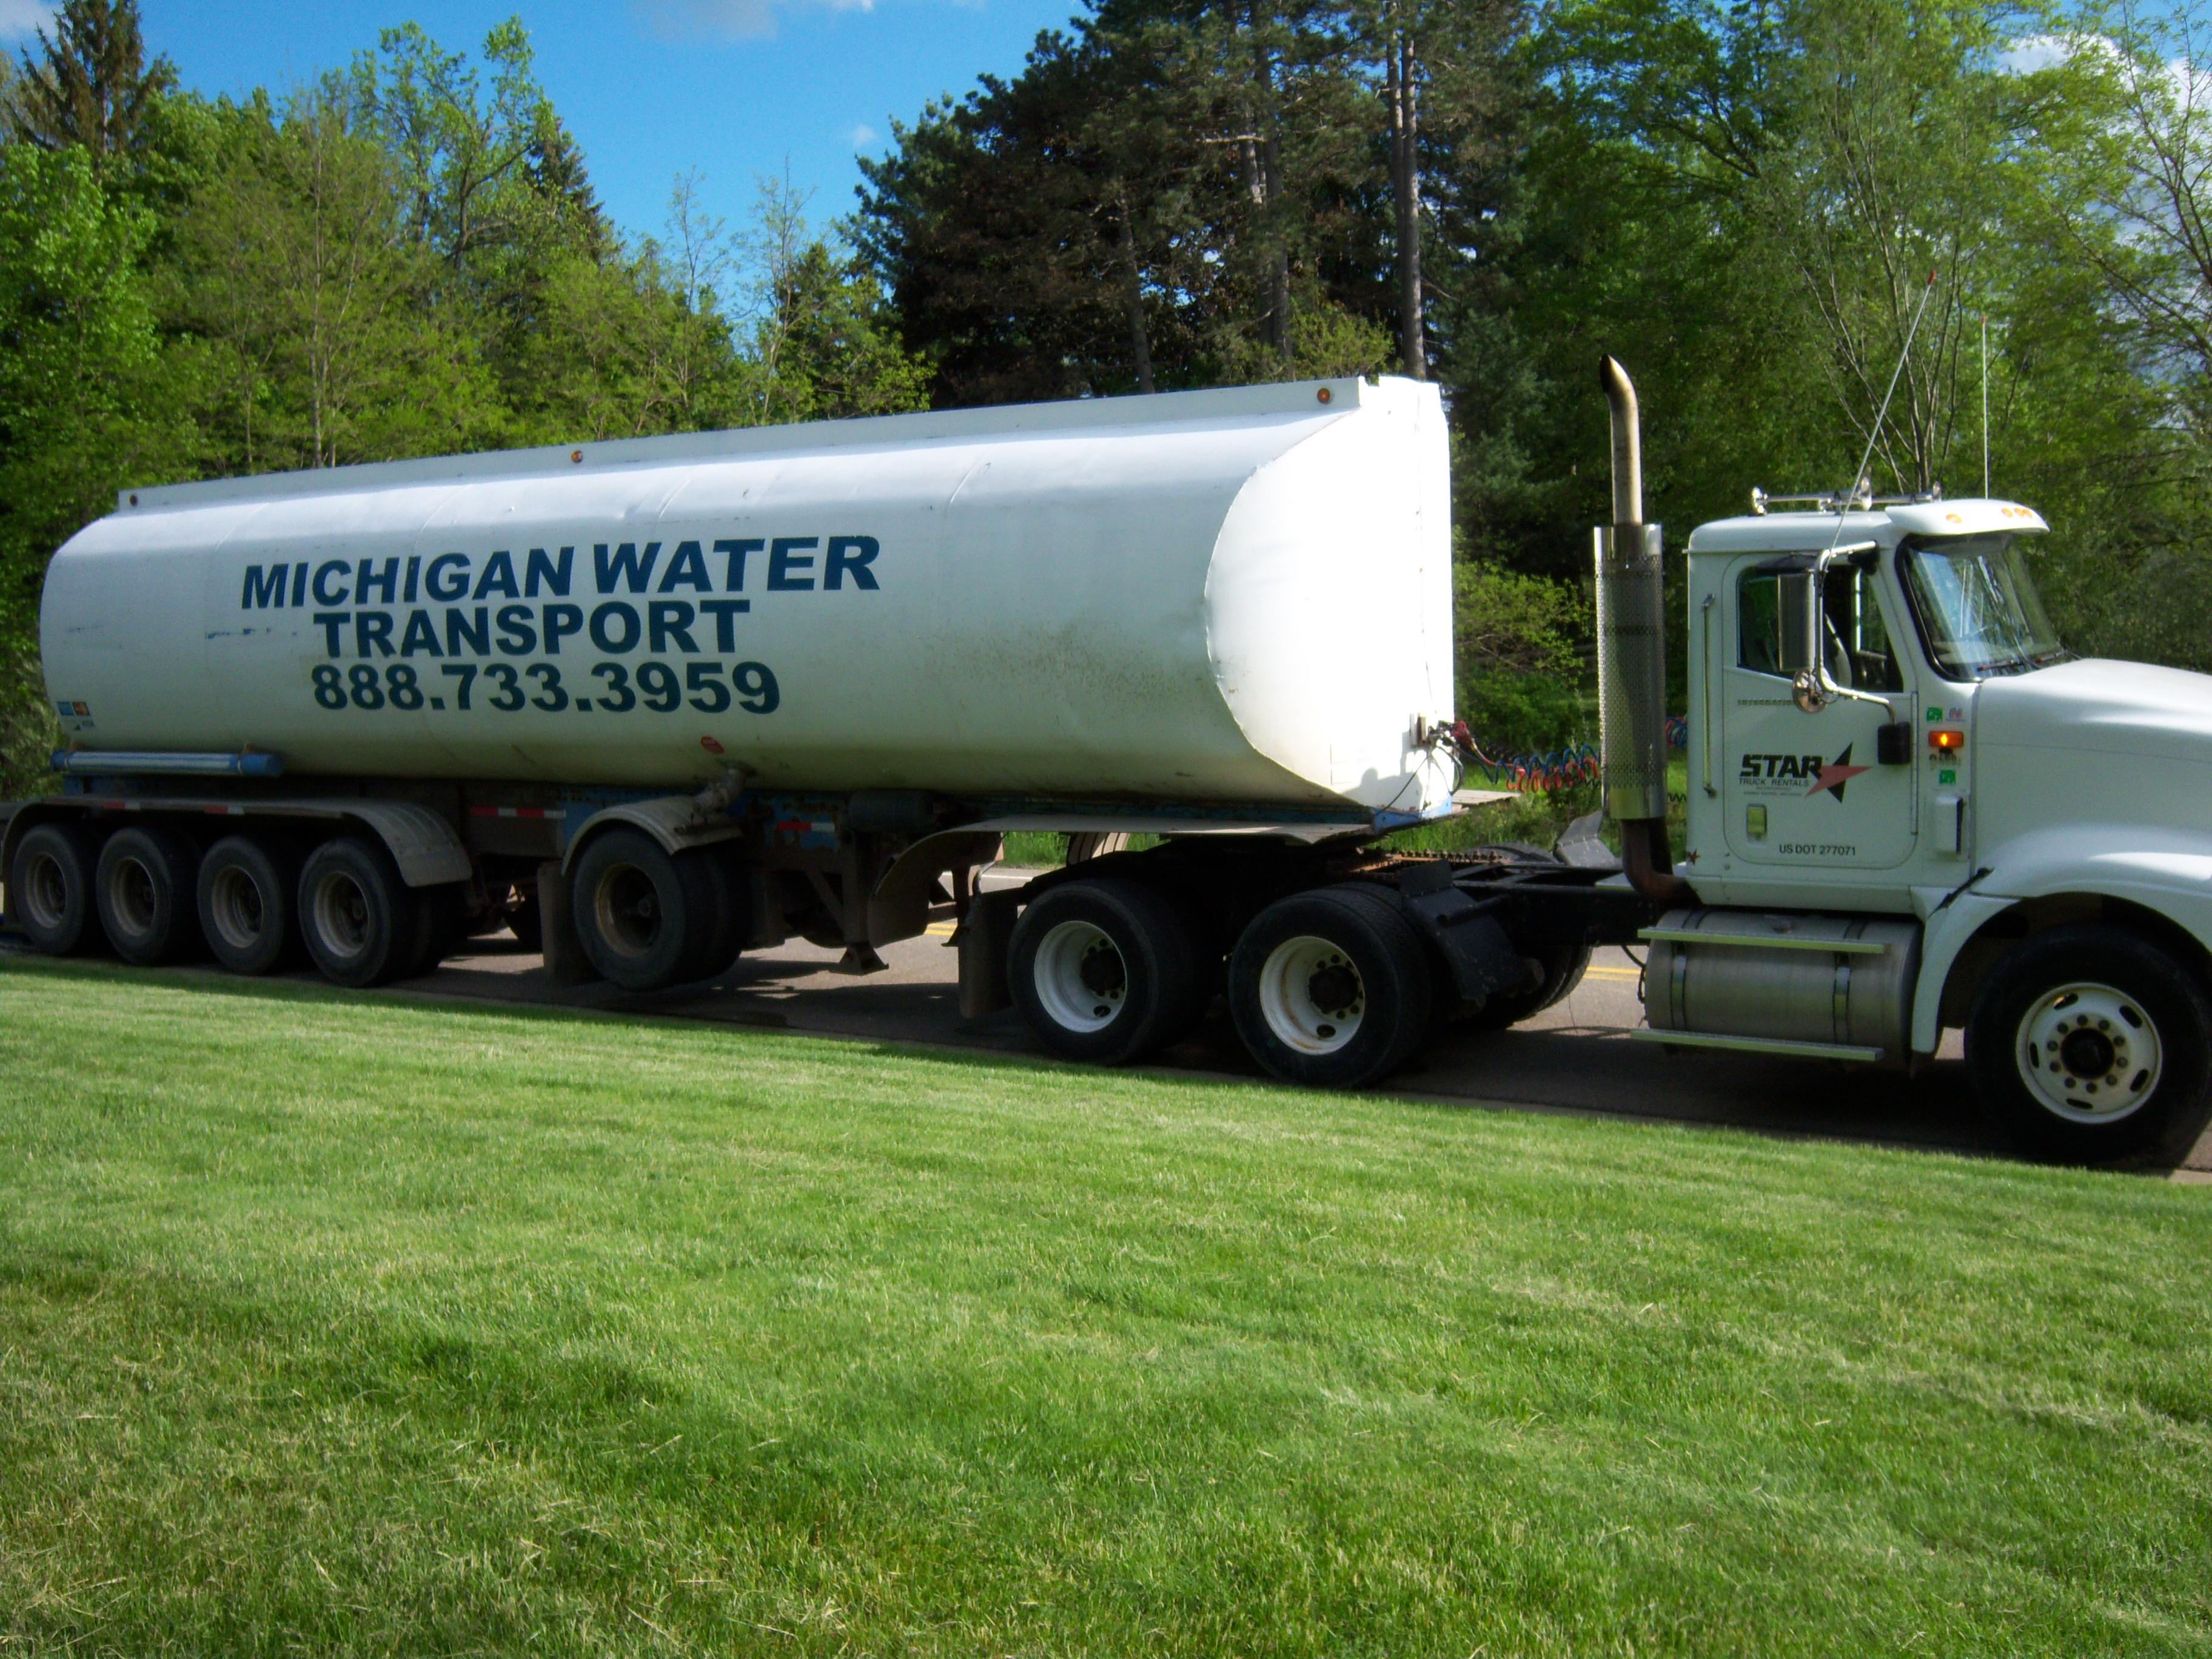 Michigan Water Transport